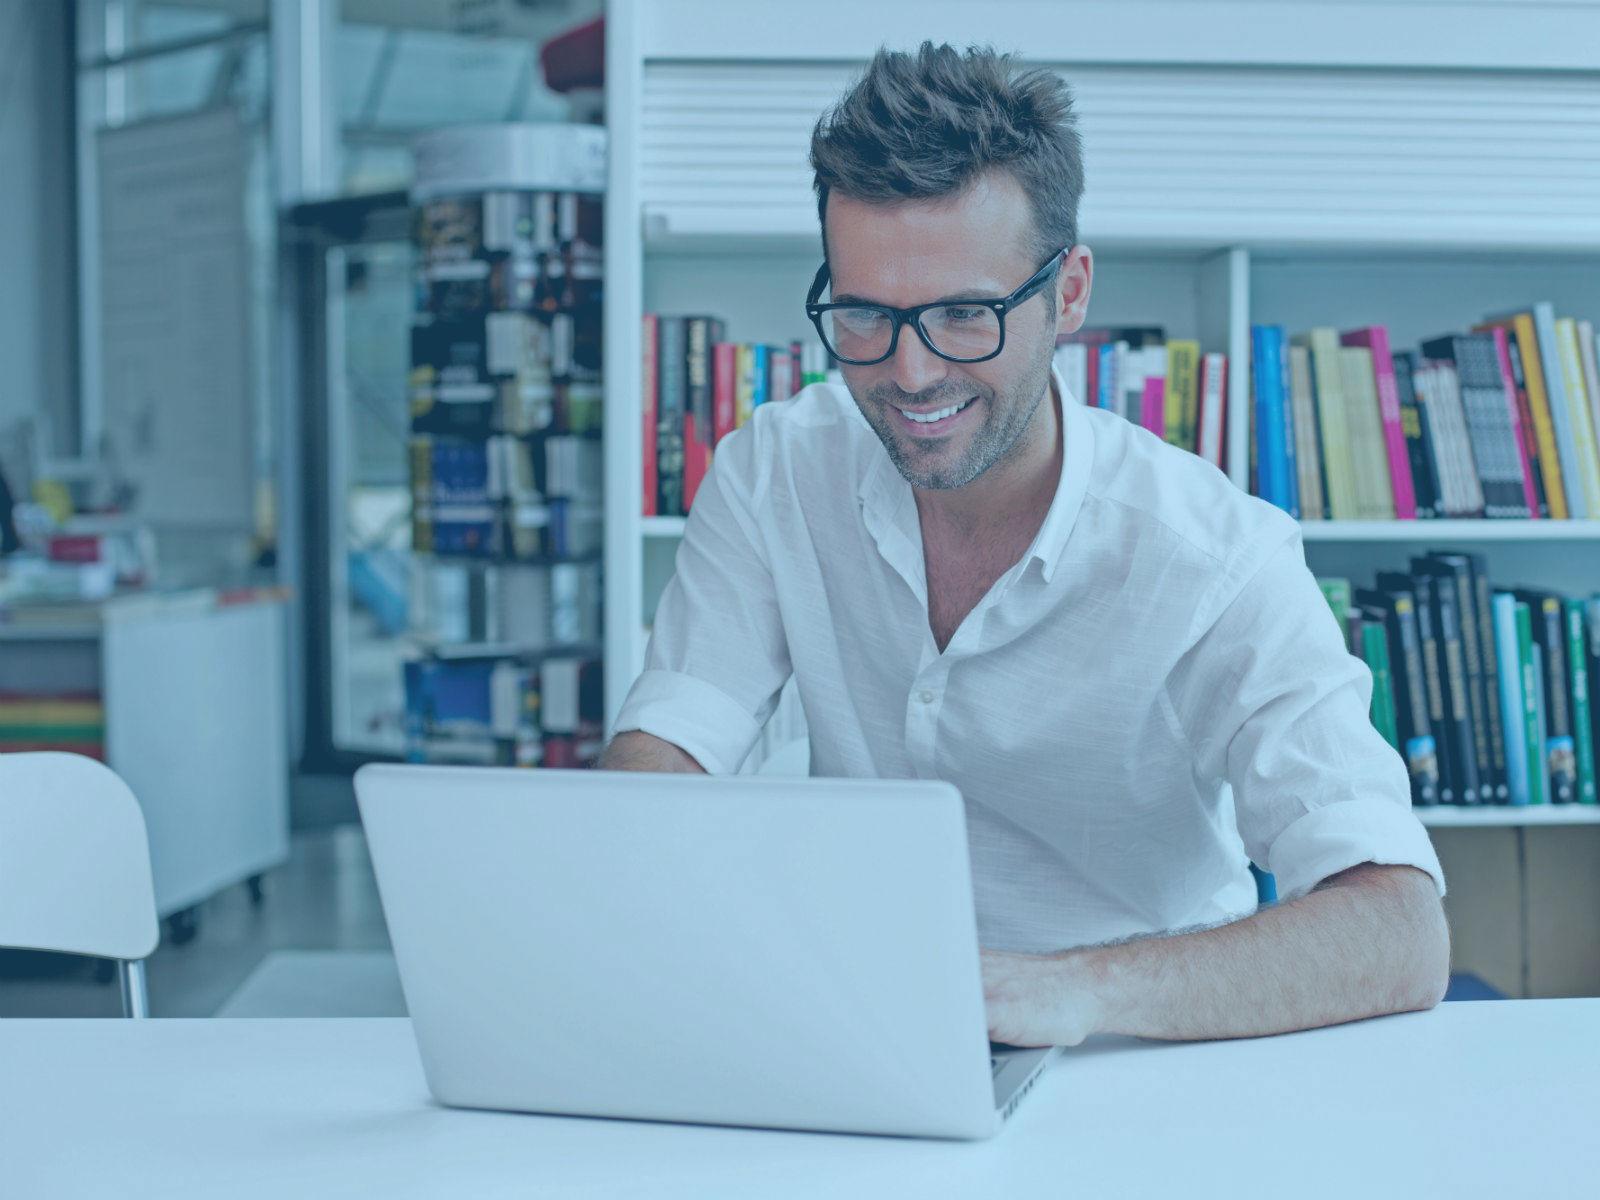 Idea bank credit online